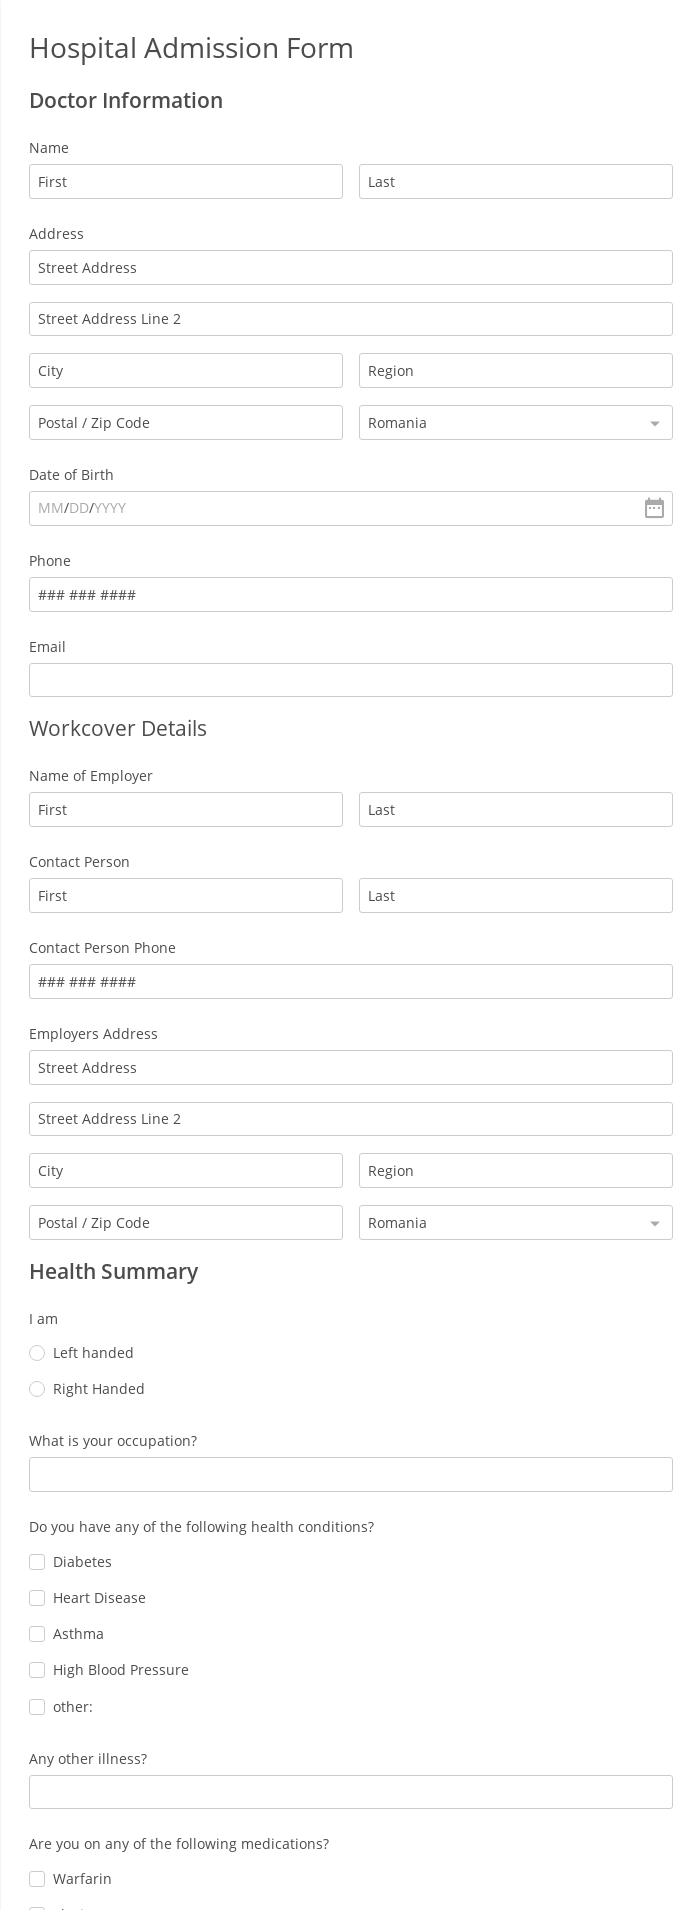 Hospital Admission Form